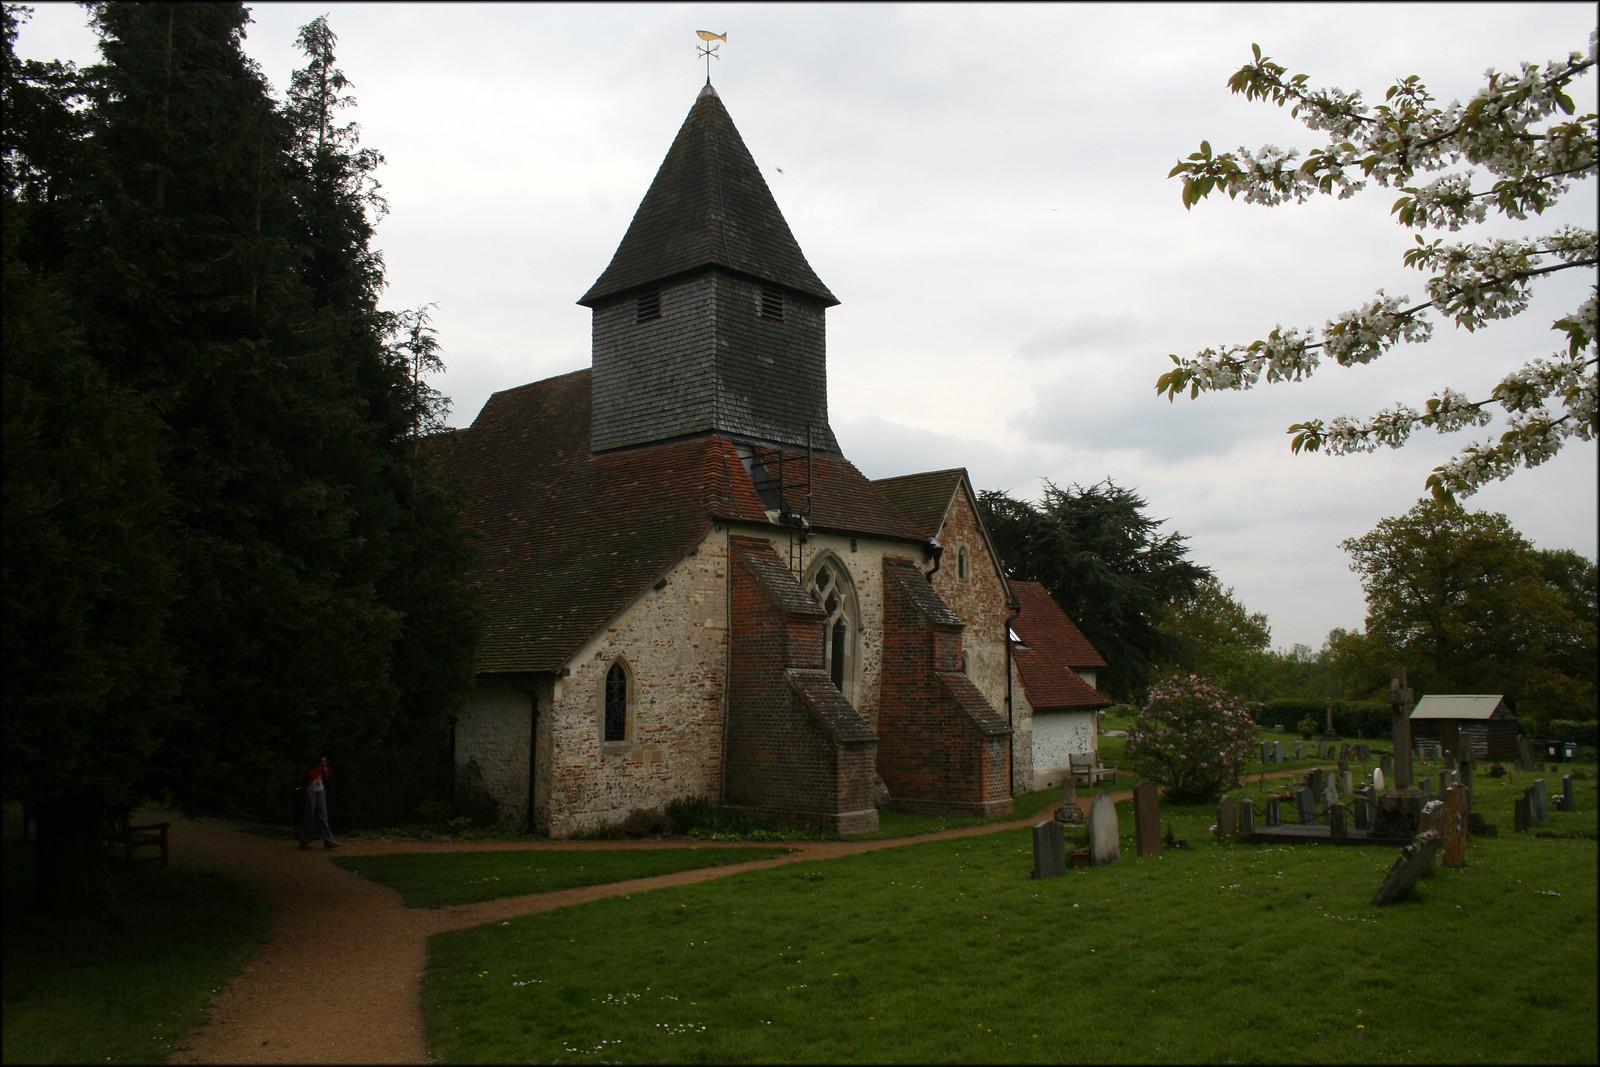 Church at Calleva Atrebatvm